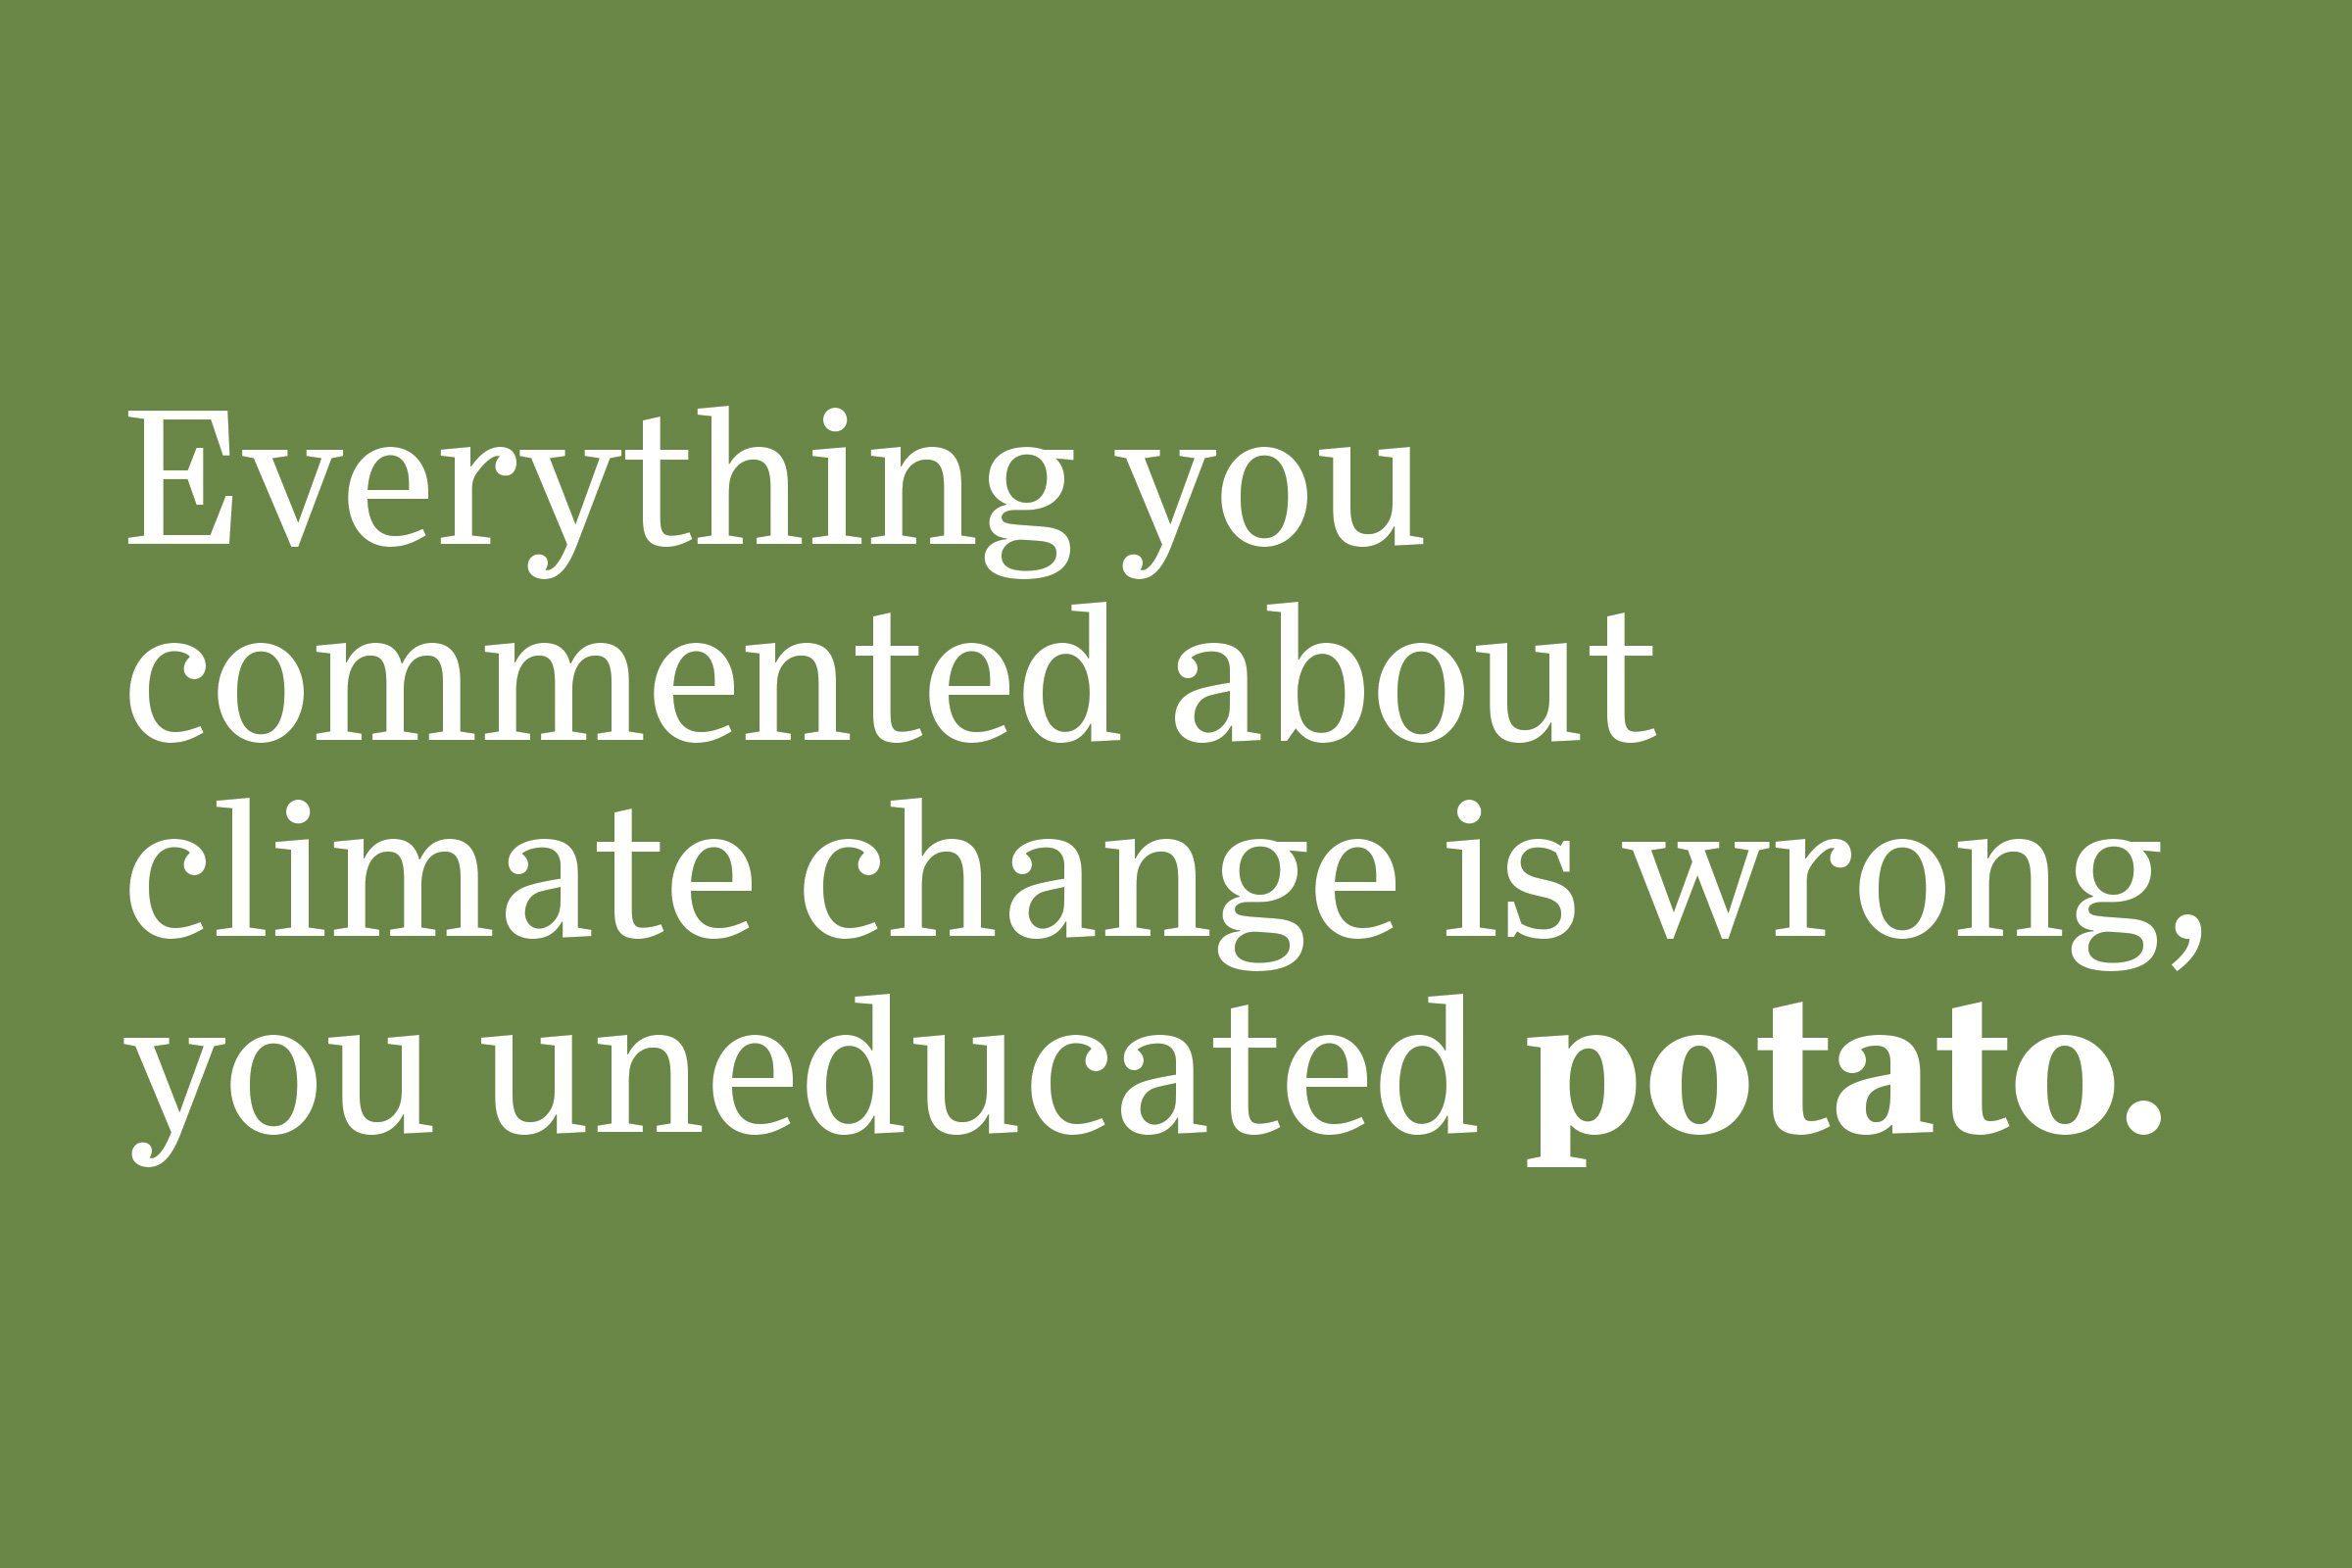 potato new slang 2020